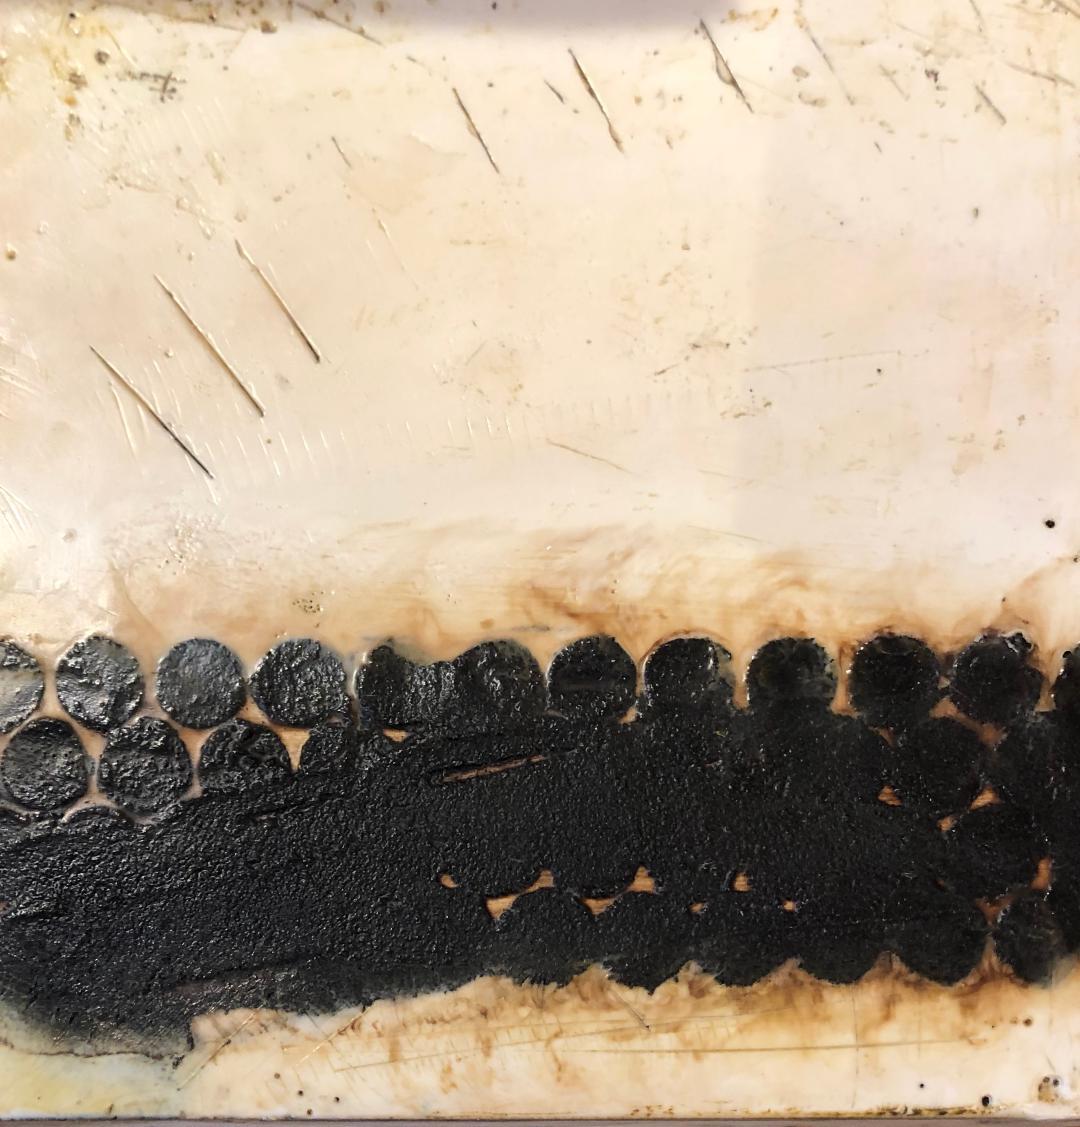 Decline of the Hive - 10 x 10 - Encaustic Mixed Media